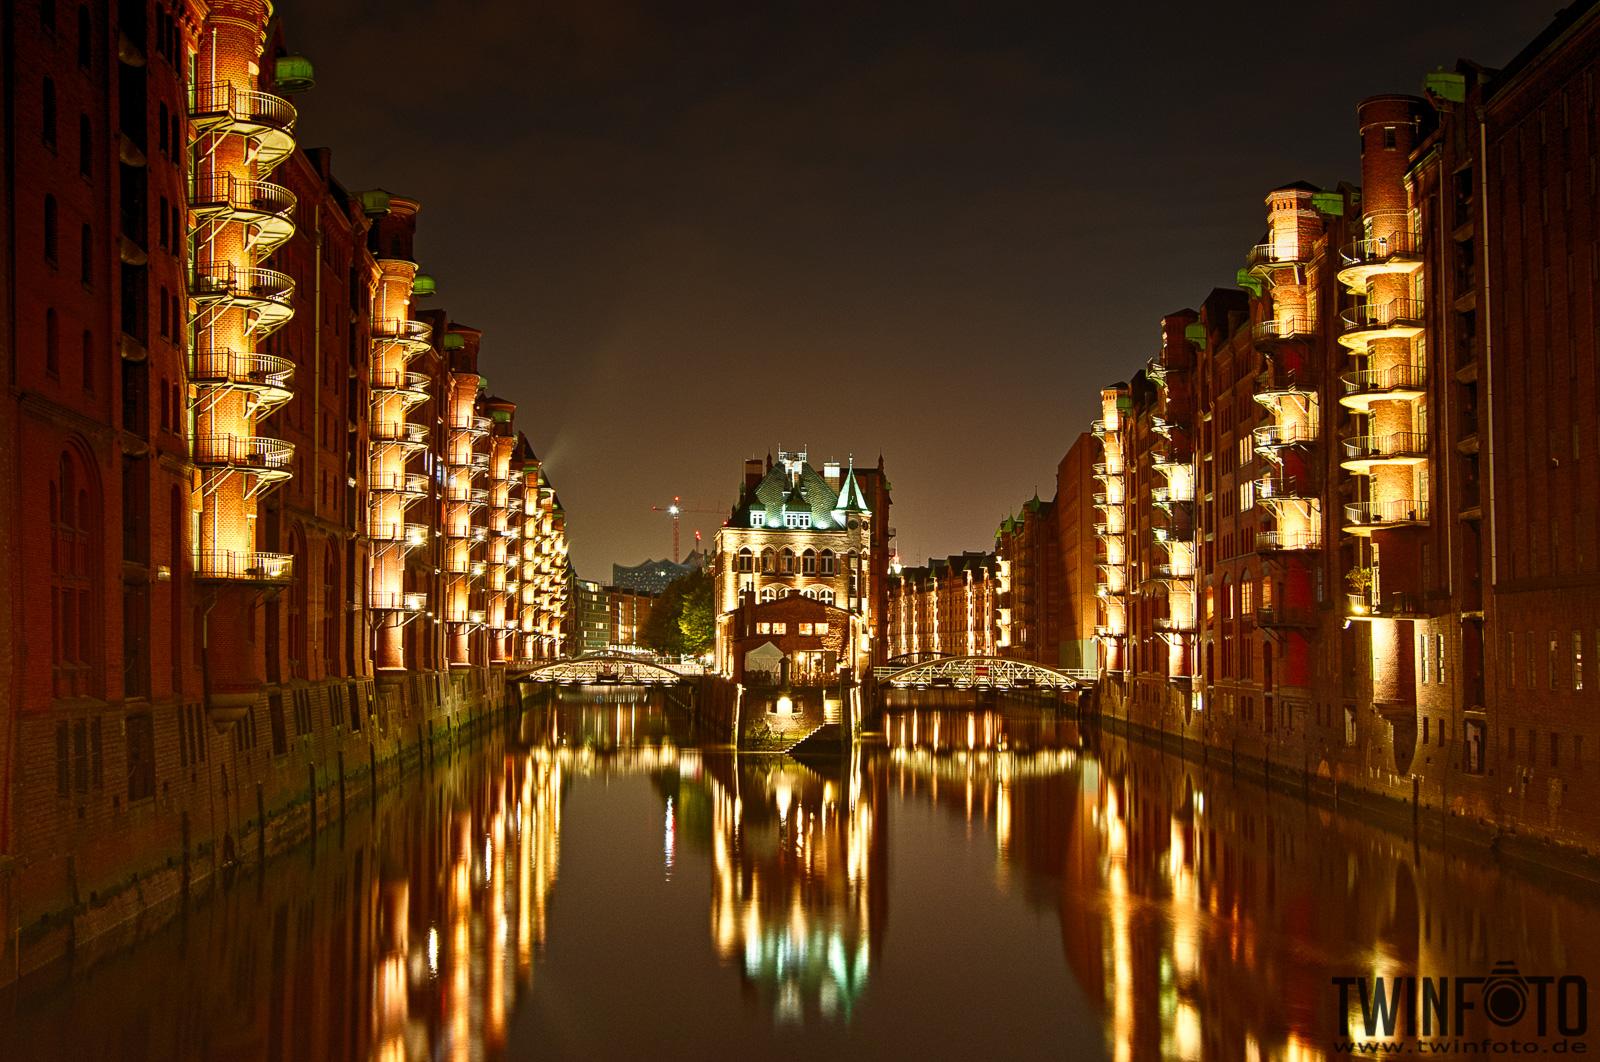 The Hamburg Warehouse City (UNESCO World Heritage Site), Germany